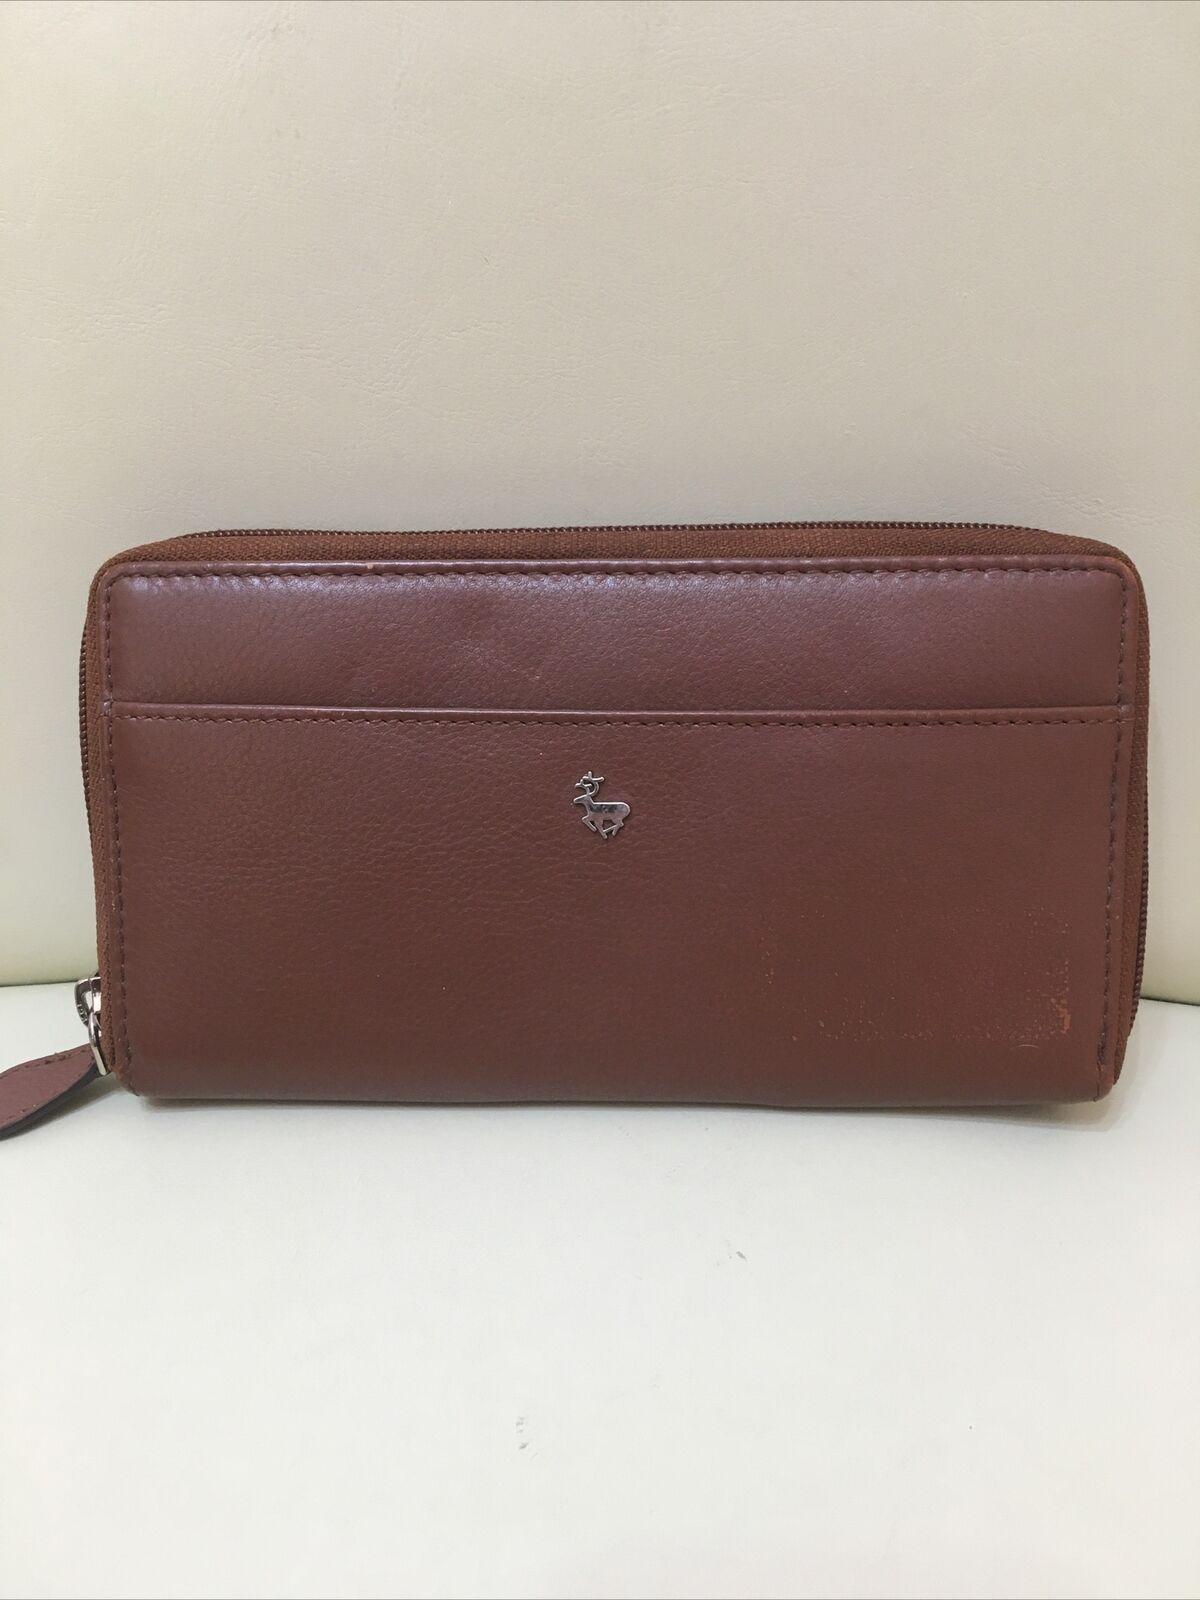 Lloyd Baker London ladies brown leather purse